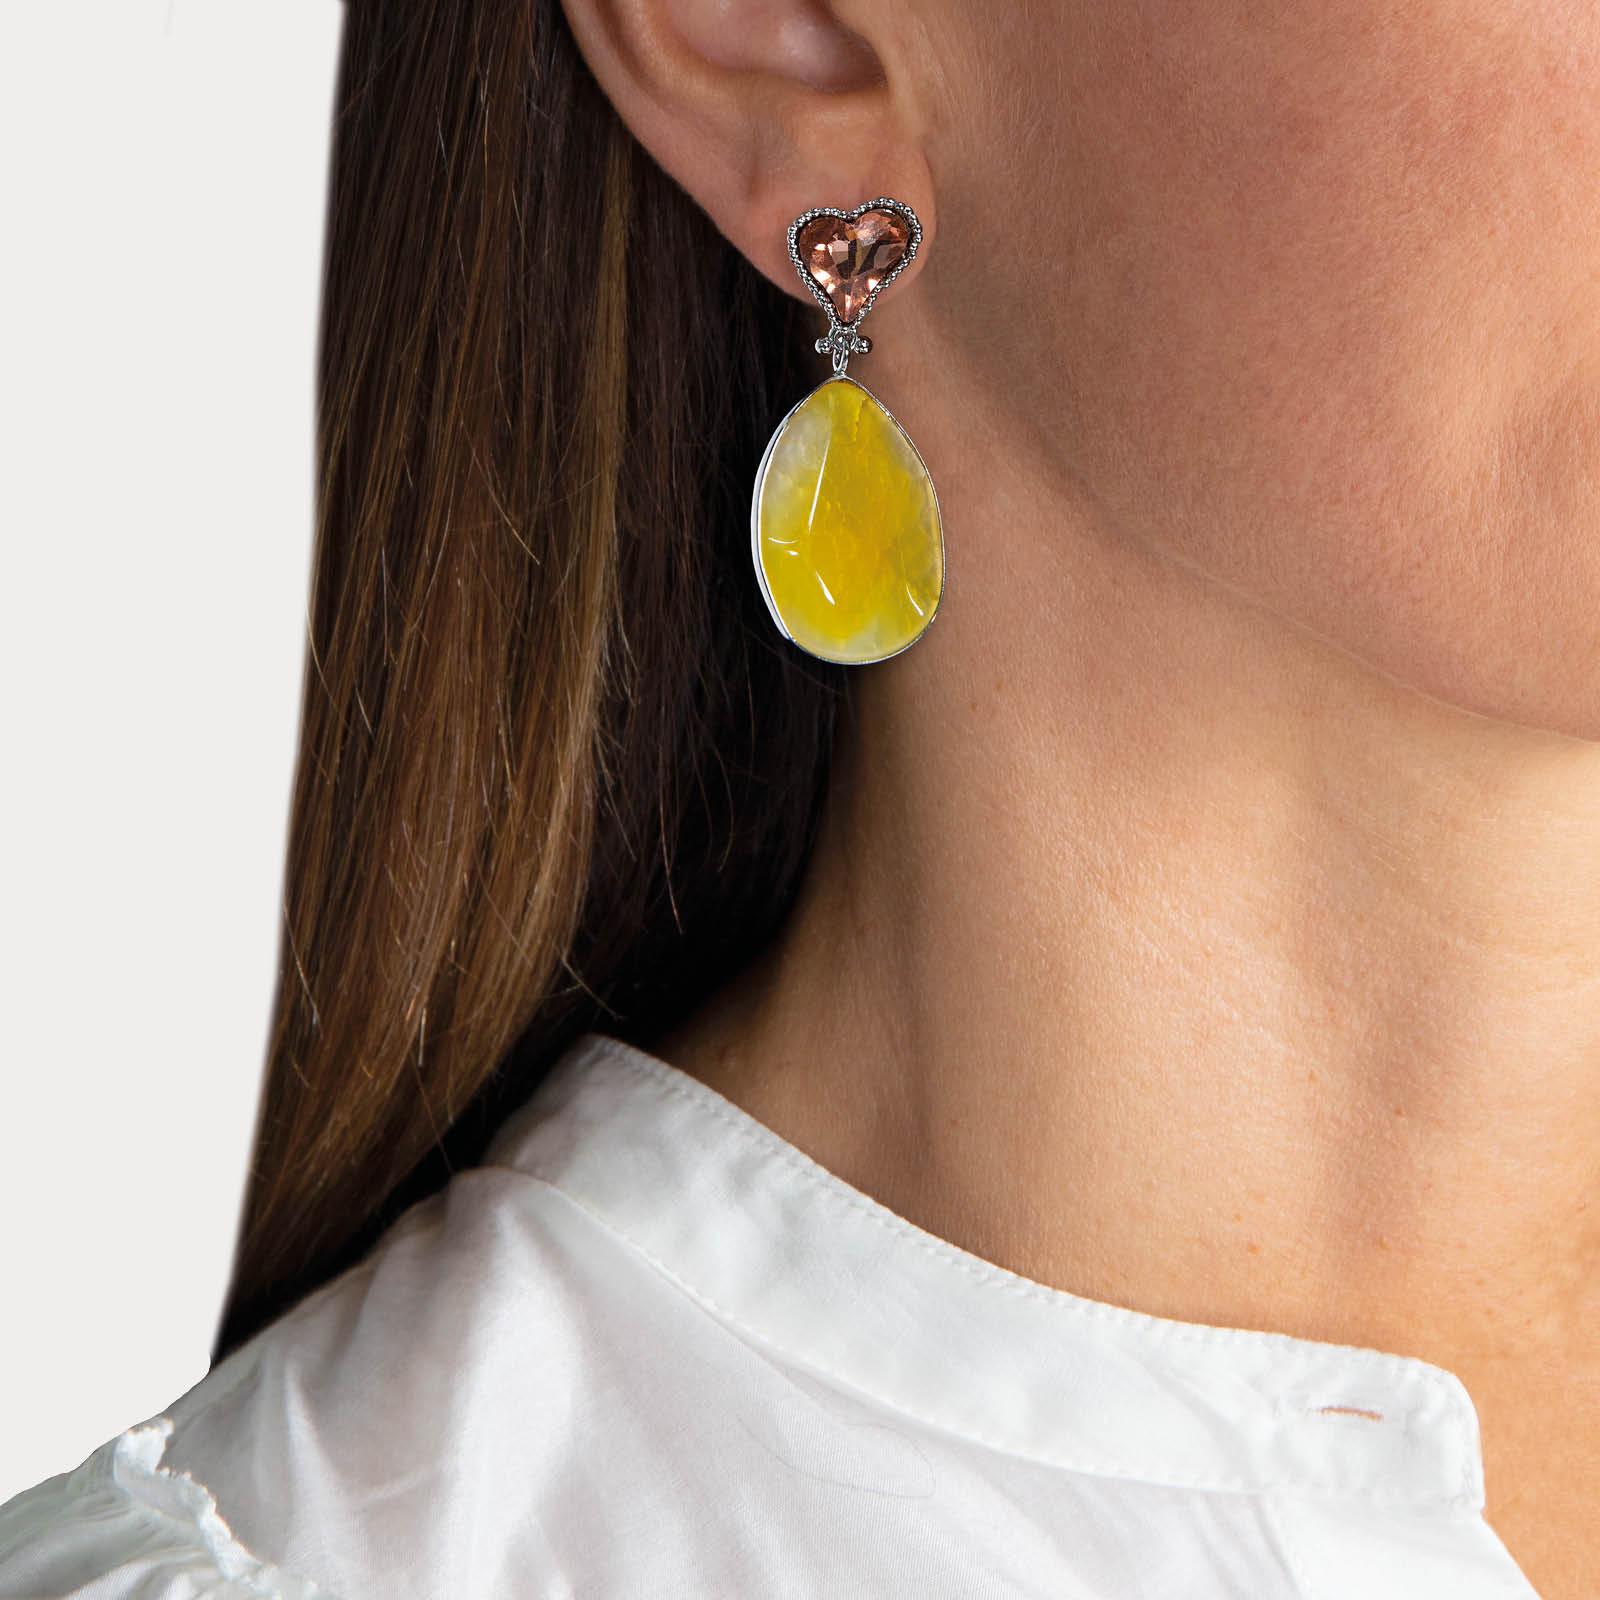 Yellow  Heart Agate Nature Stone Earrings